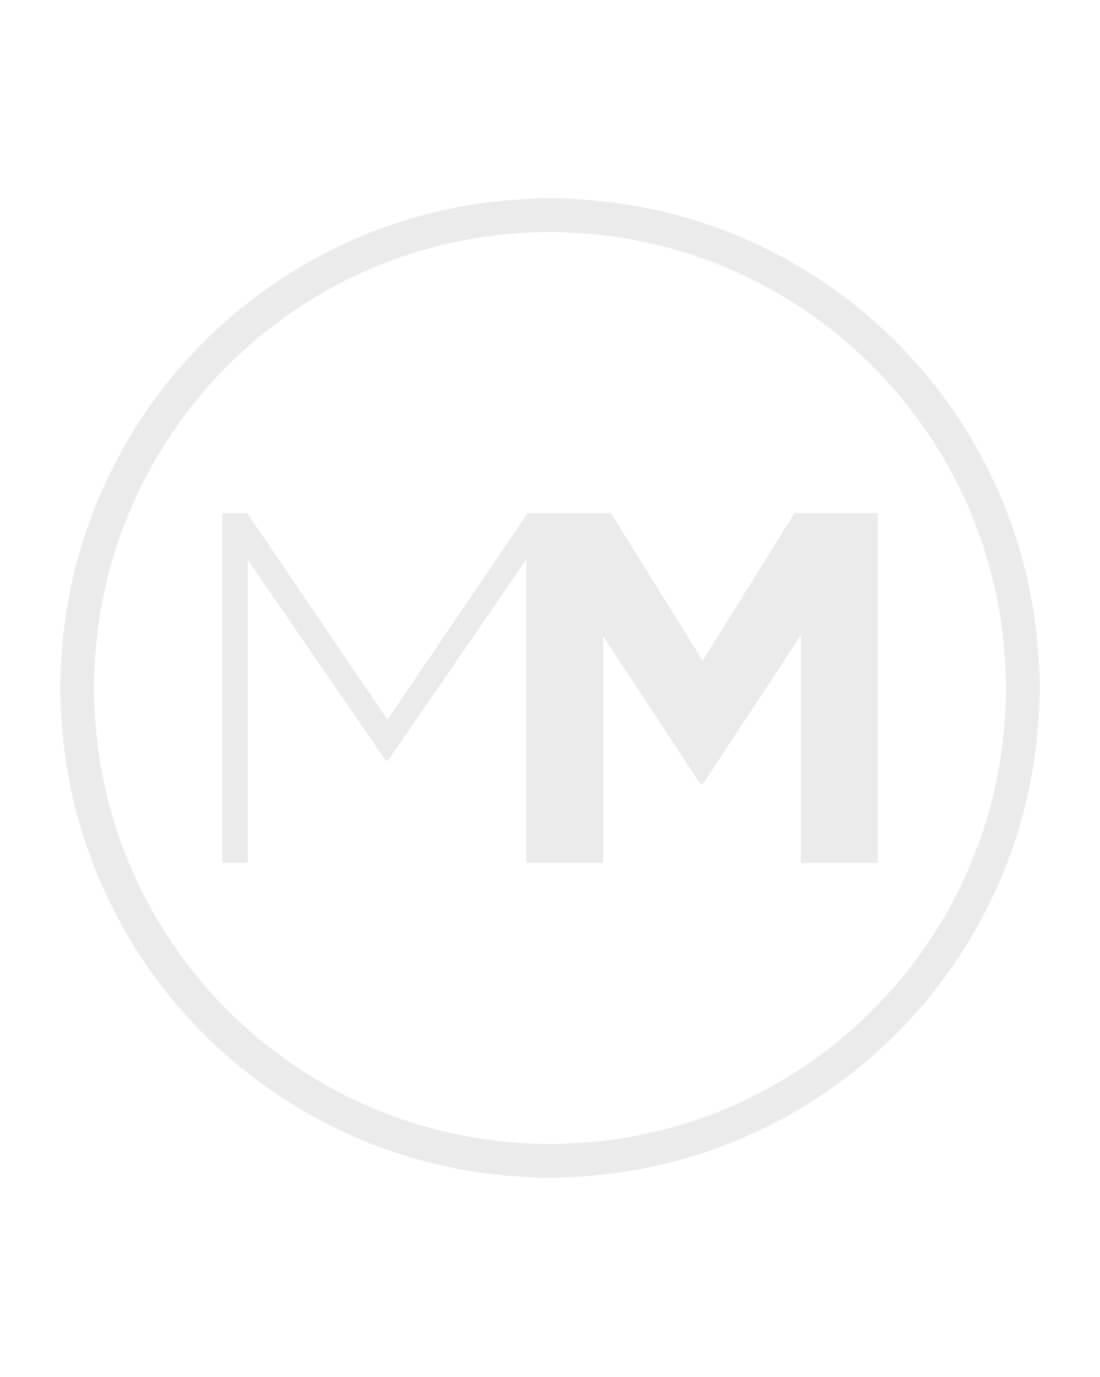 Kocca Bikdae / Zwart jurkje